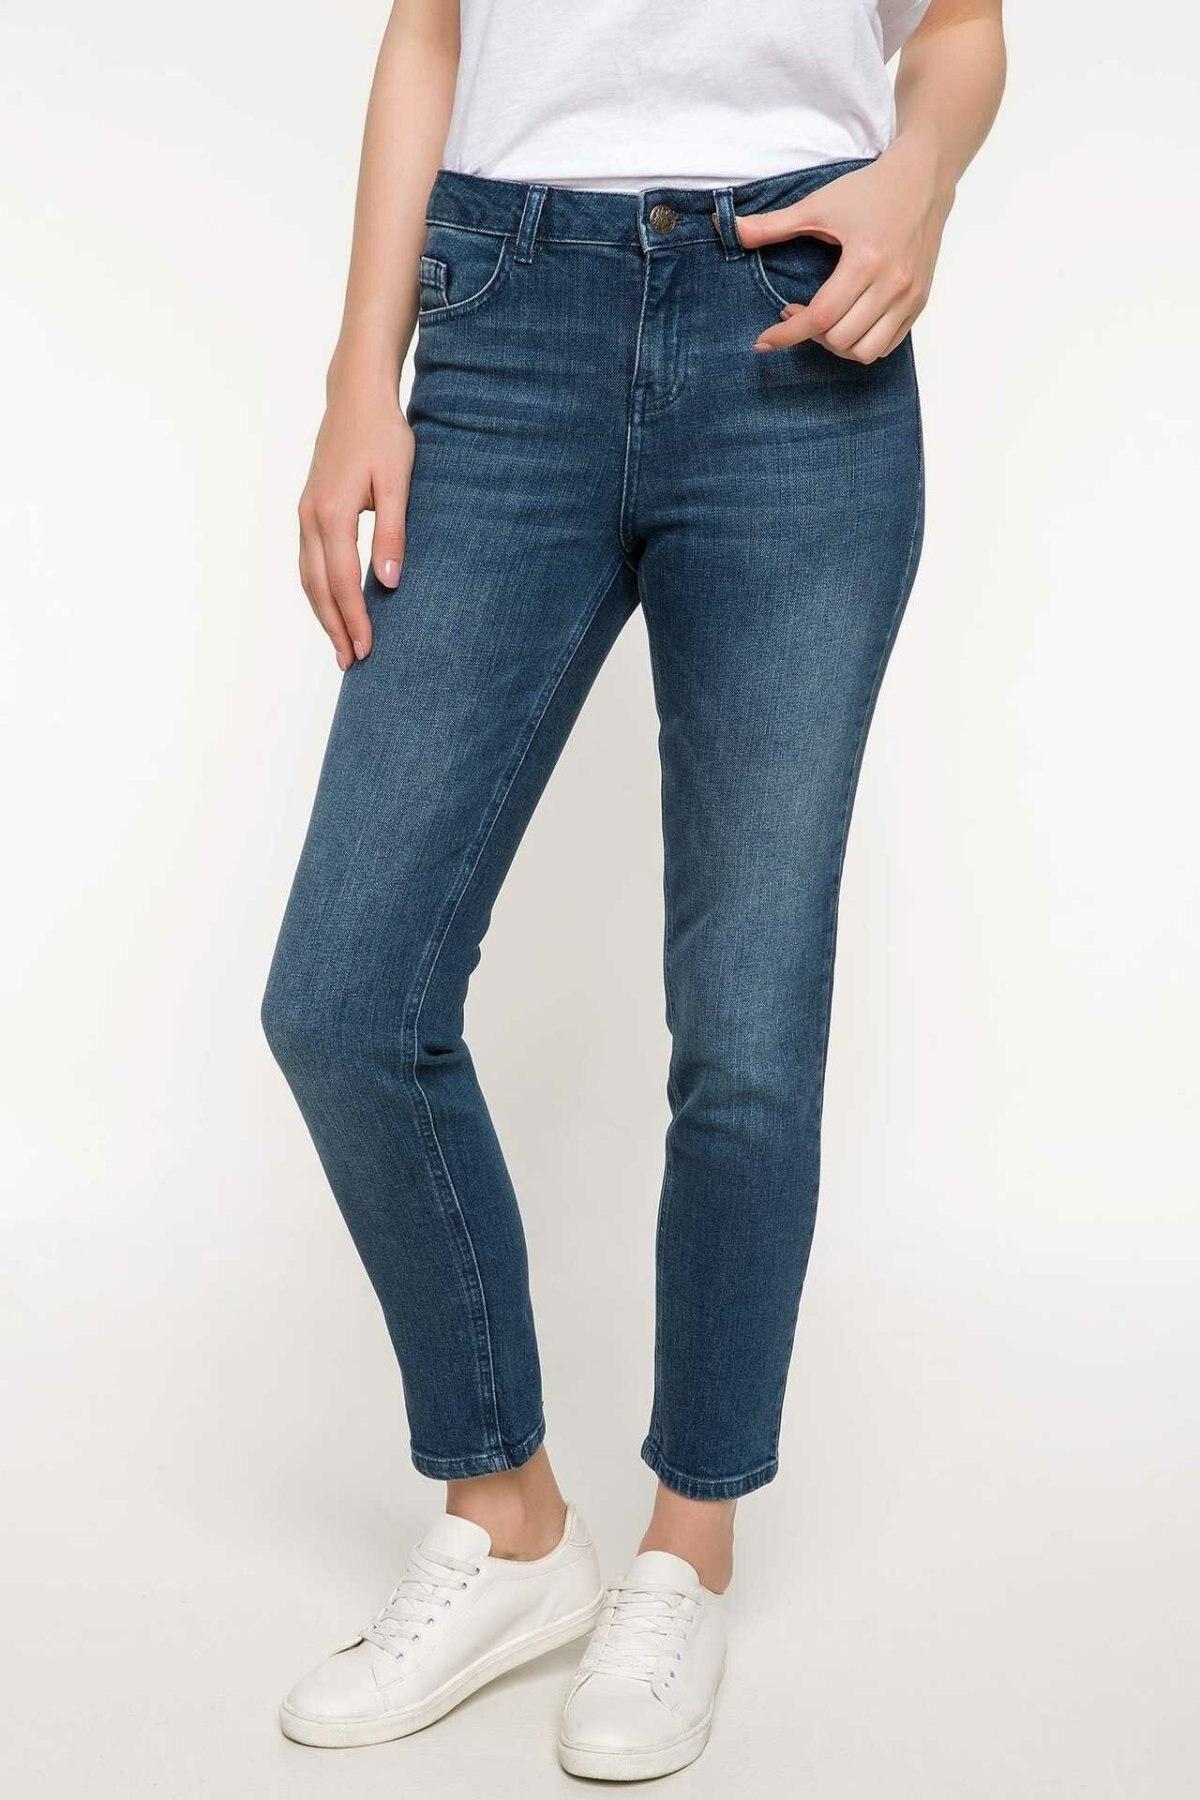 DeFacto Blue Women Skinny Jeans Denim Simple Mid-waist Denim Stretch Fashion Nine Minutes Pencil Trousers-J2688AZ18SM